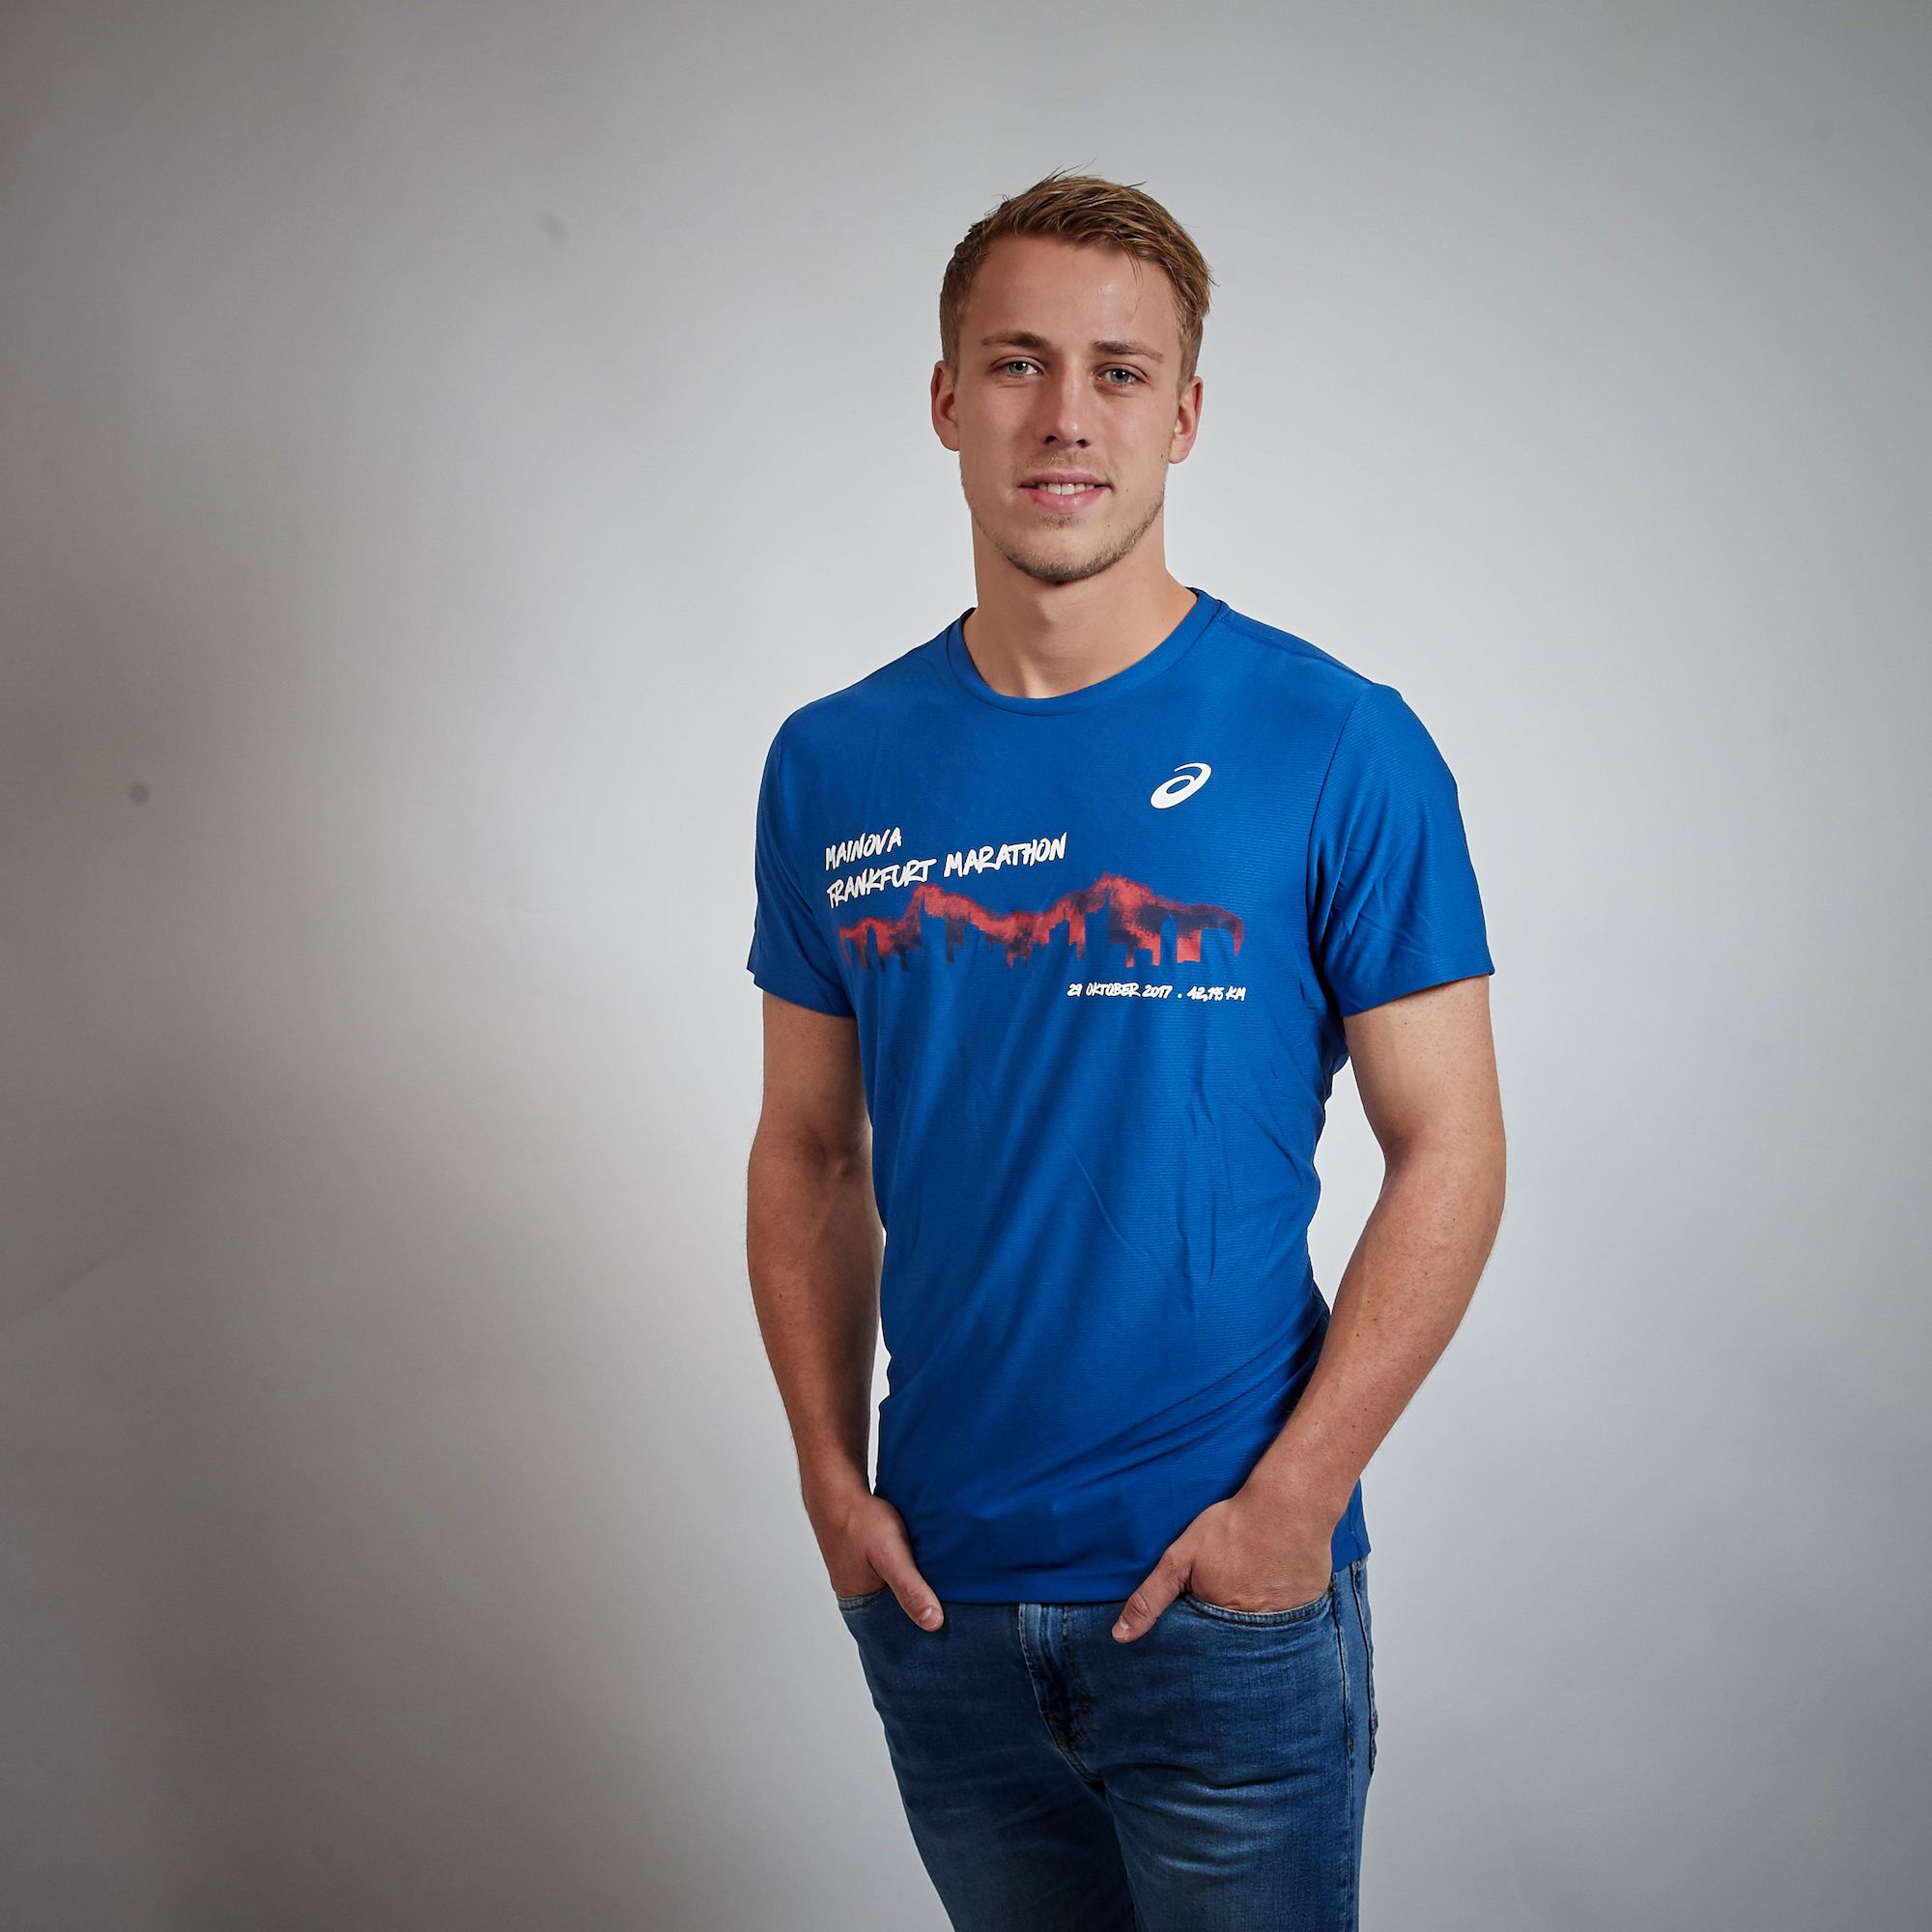 Asics Eventline T Shirt Mainova Frankfurt Marathon 2017 Herren